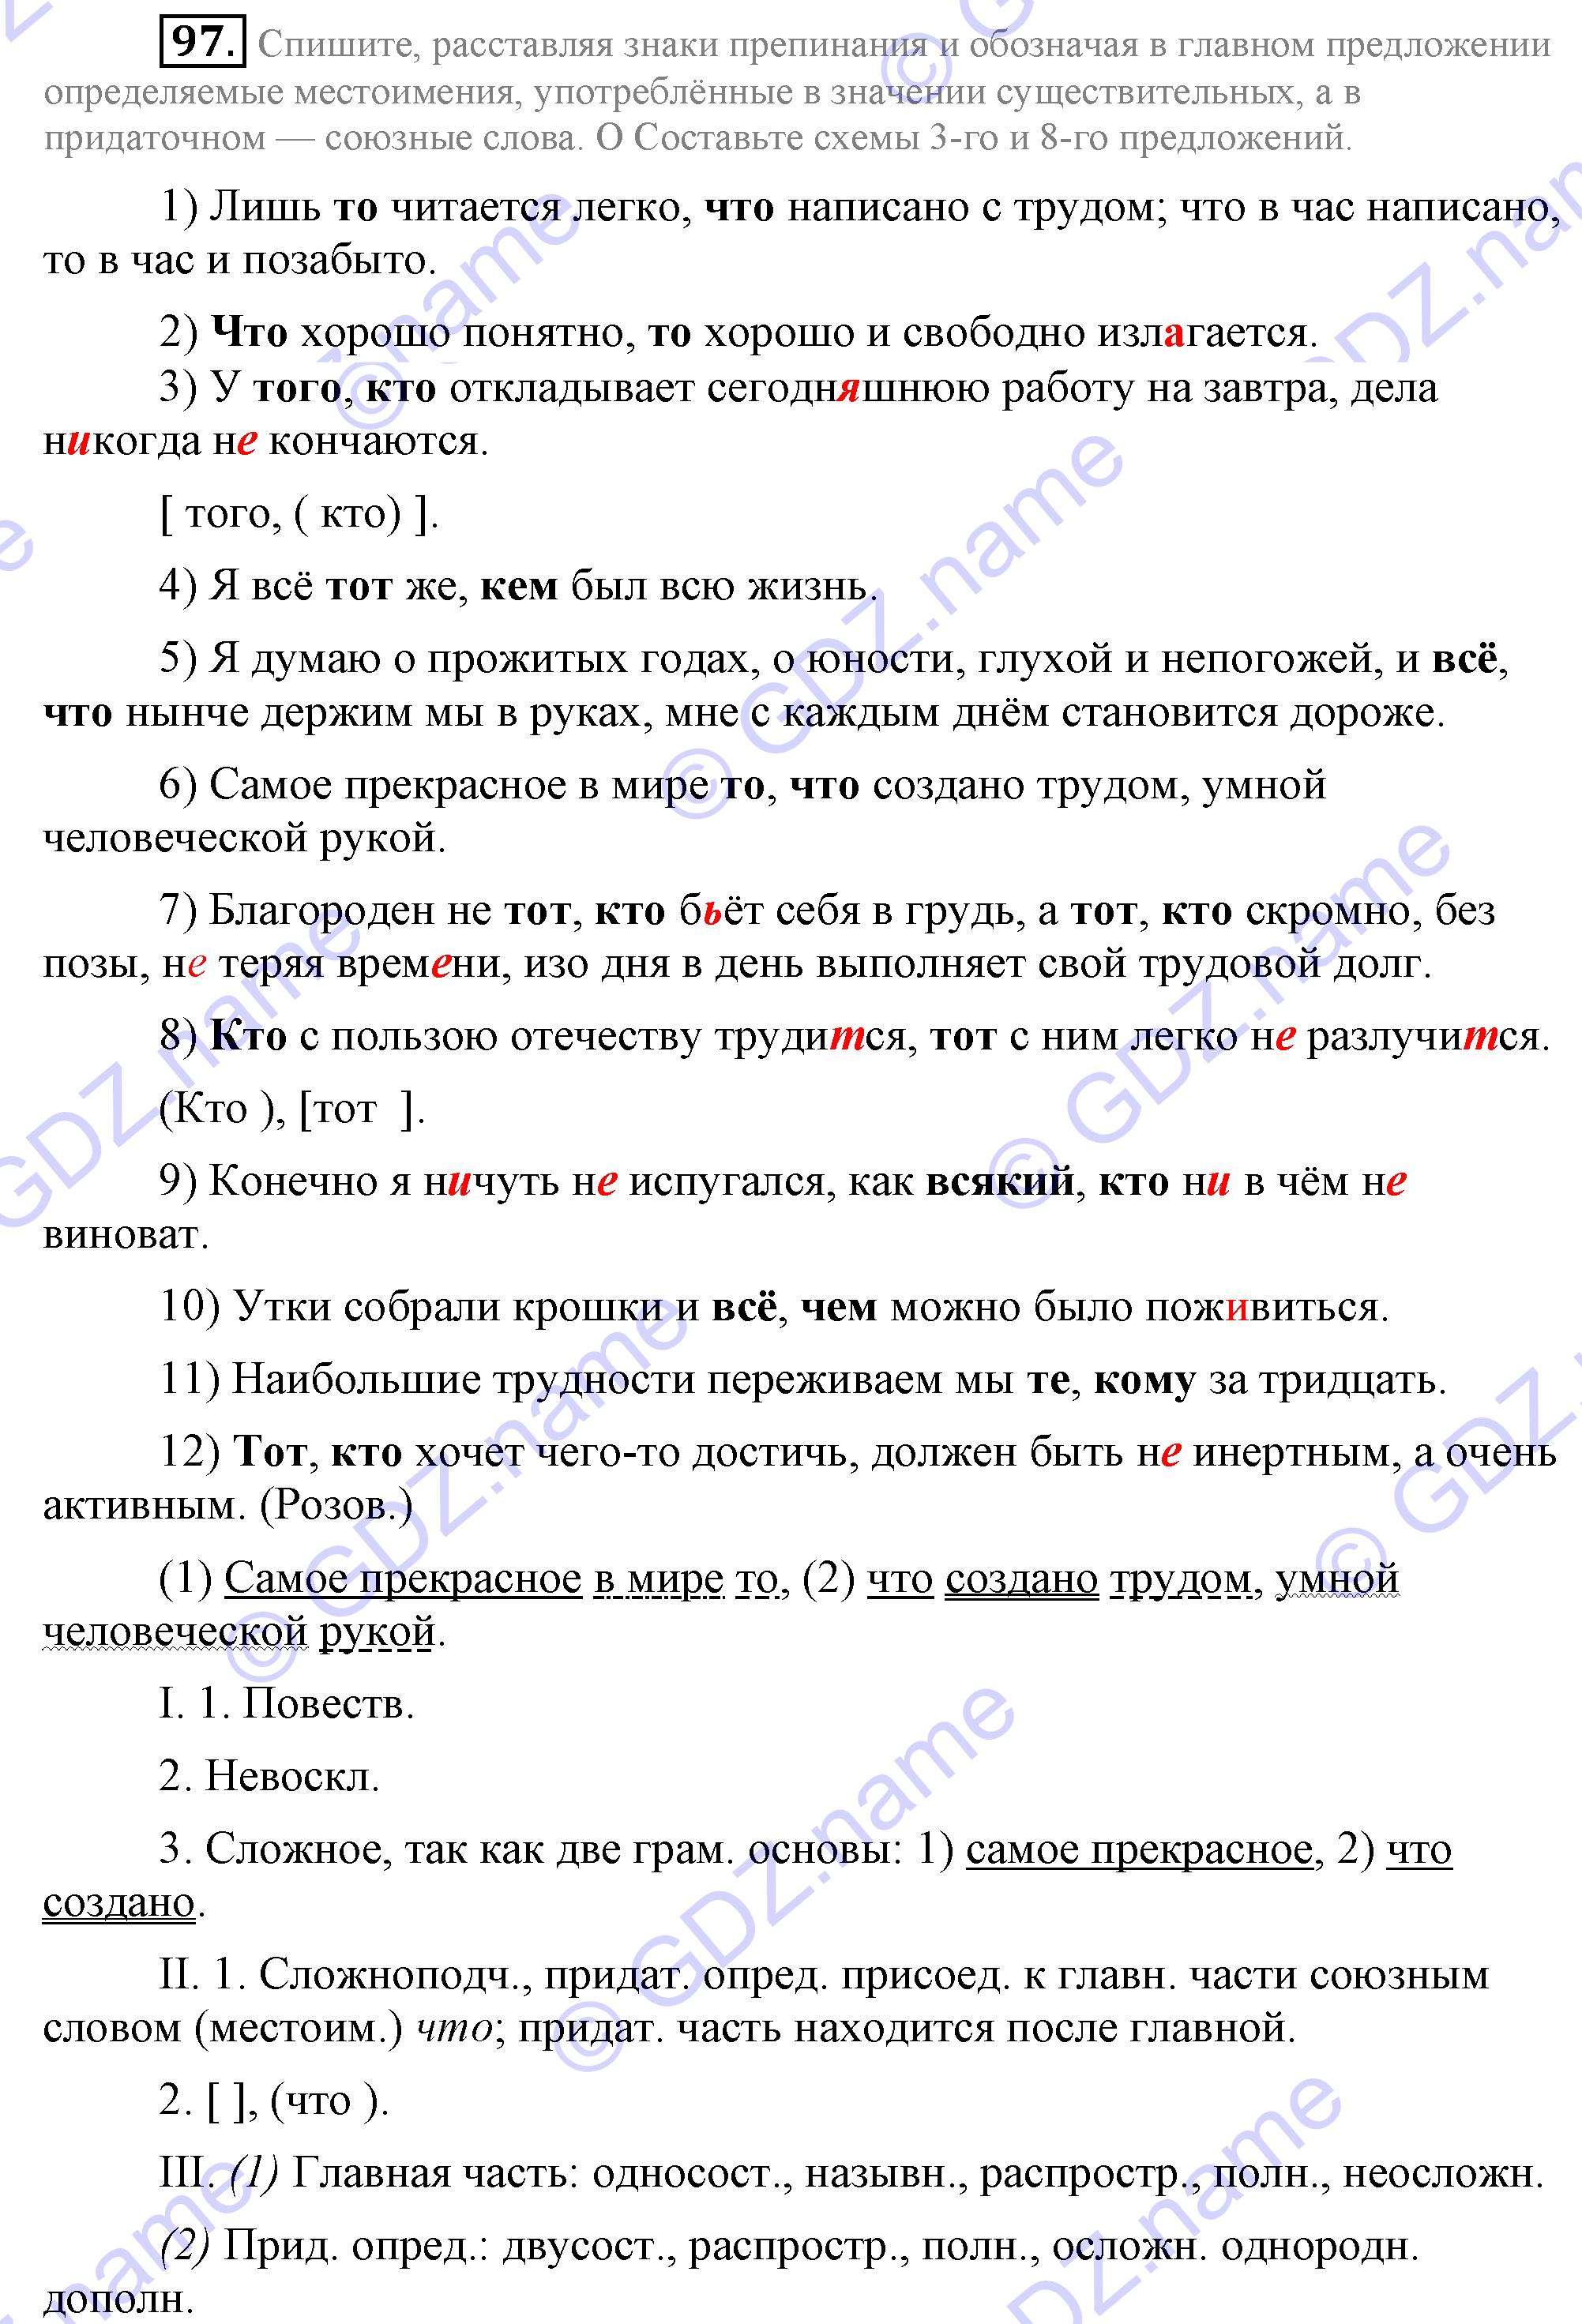 Гдз по русскому класс 2002г